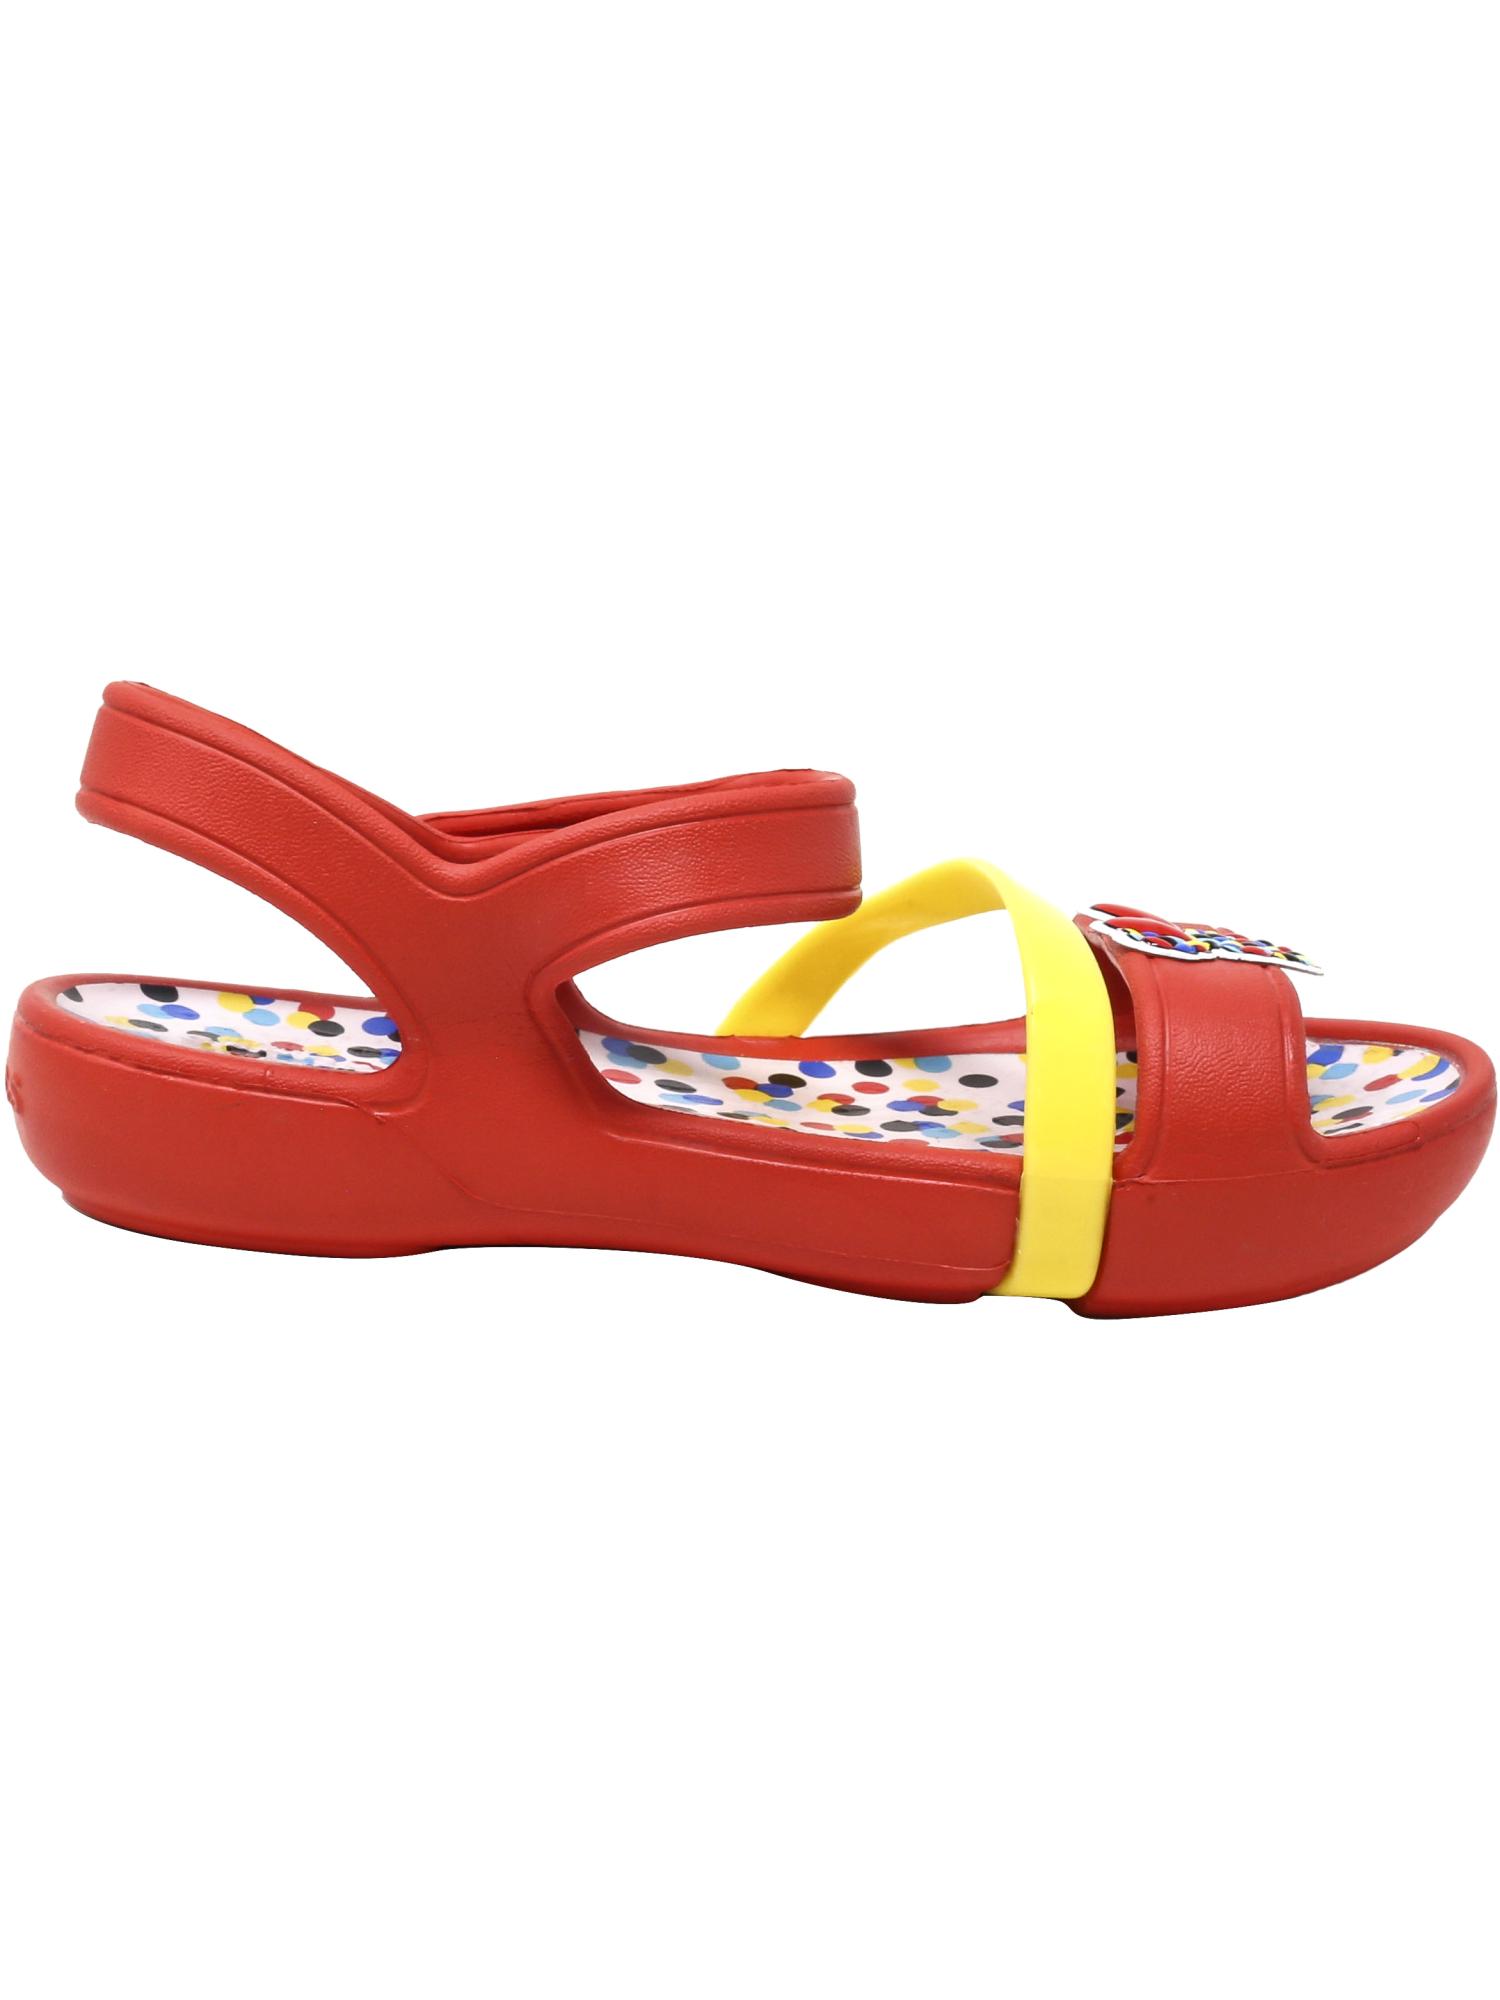 e97fe33eced74f Crocs Lina Minnie Sandal